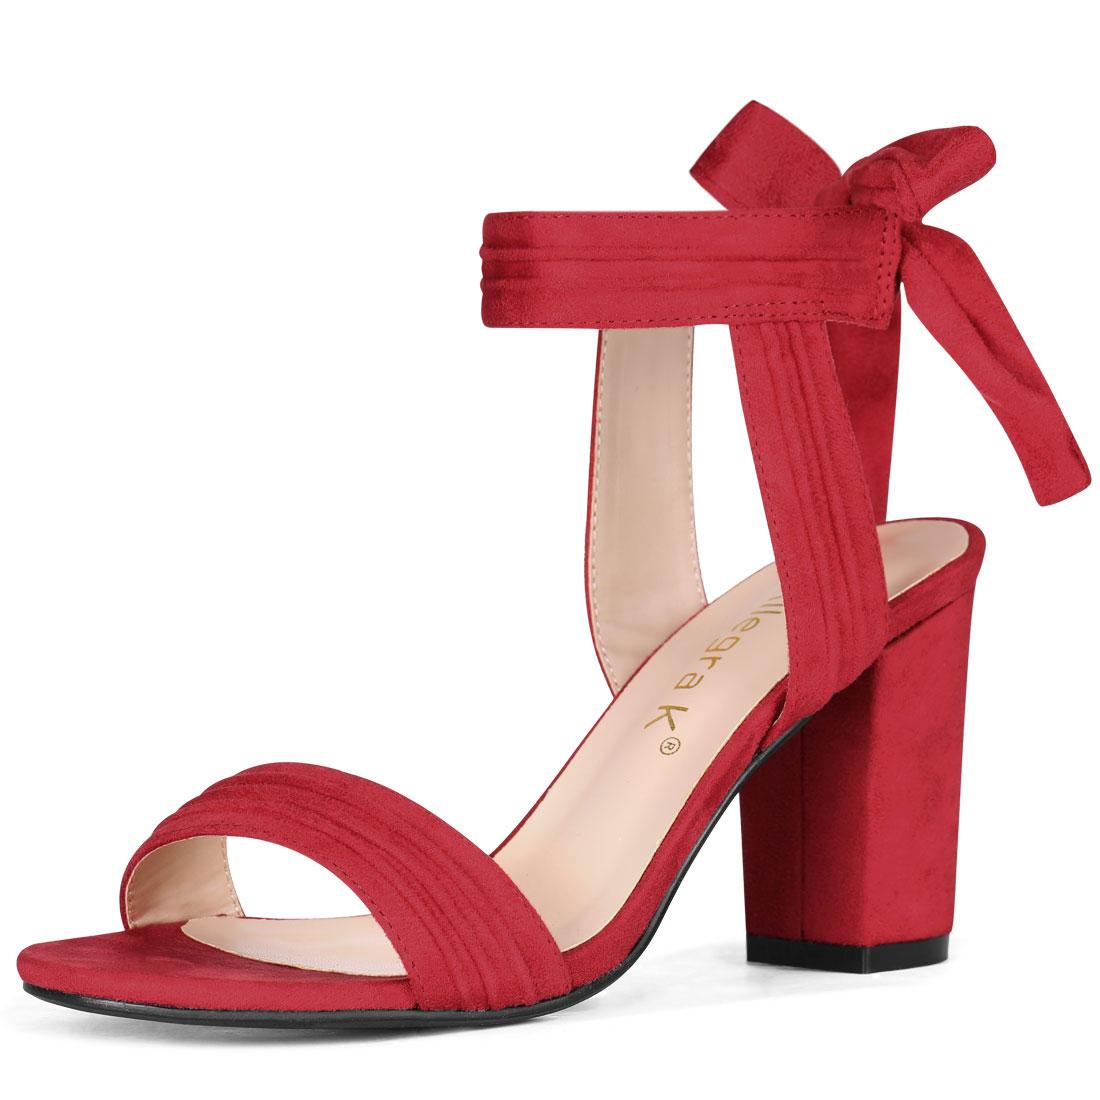 Allegra K Women's Open Toe Ankle Tie Back Chunky Heel Sandals Red US 5.5